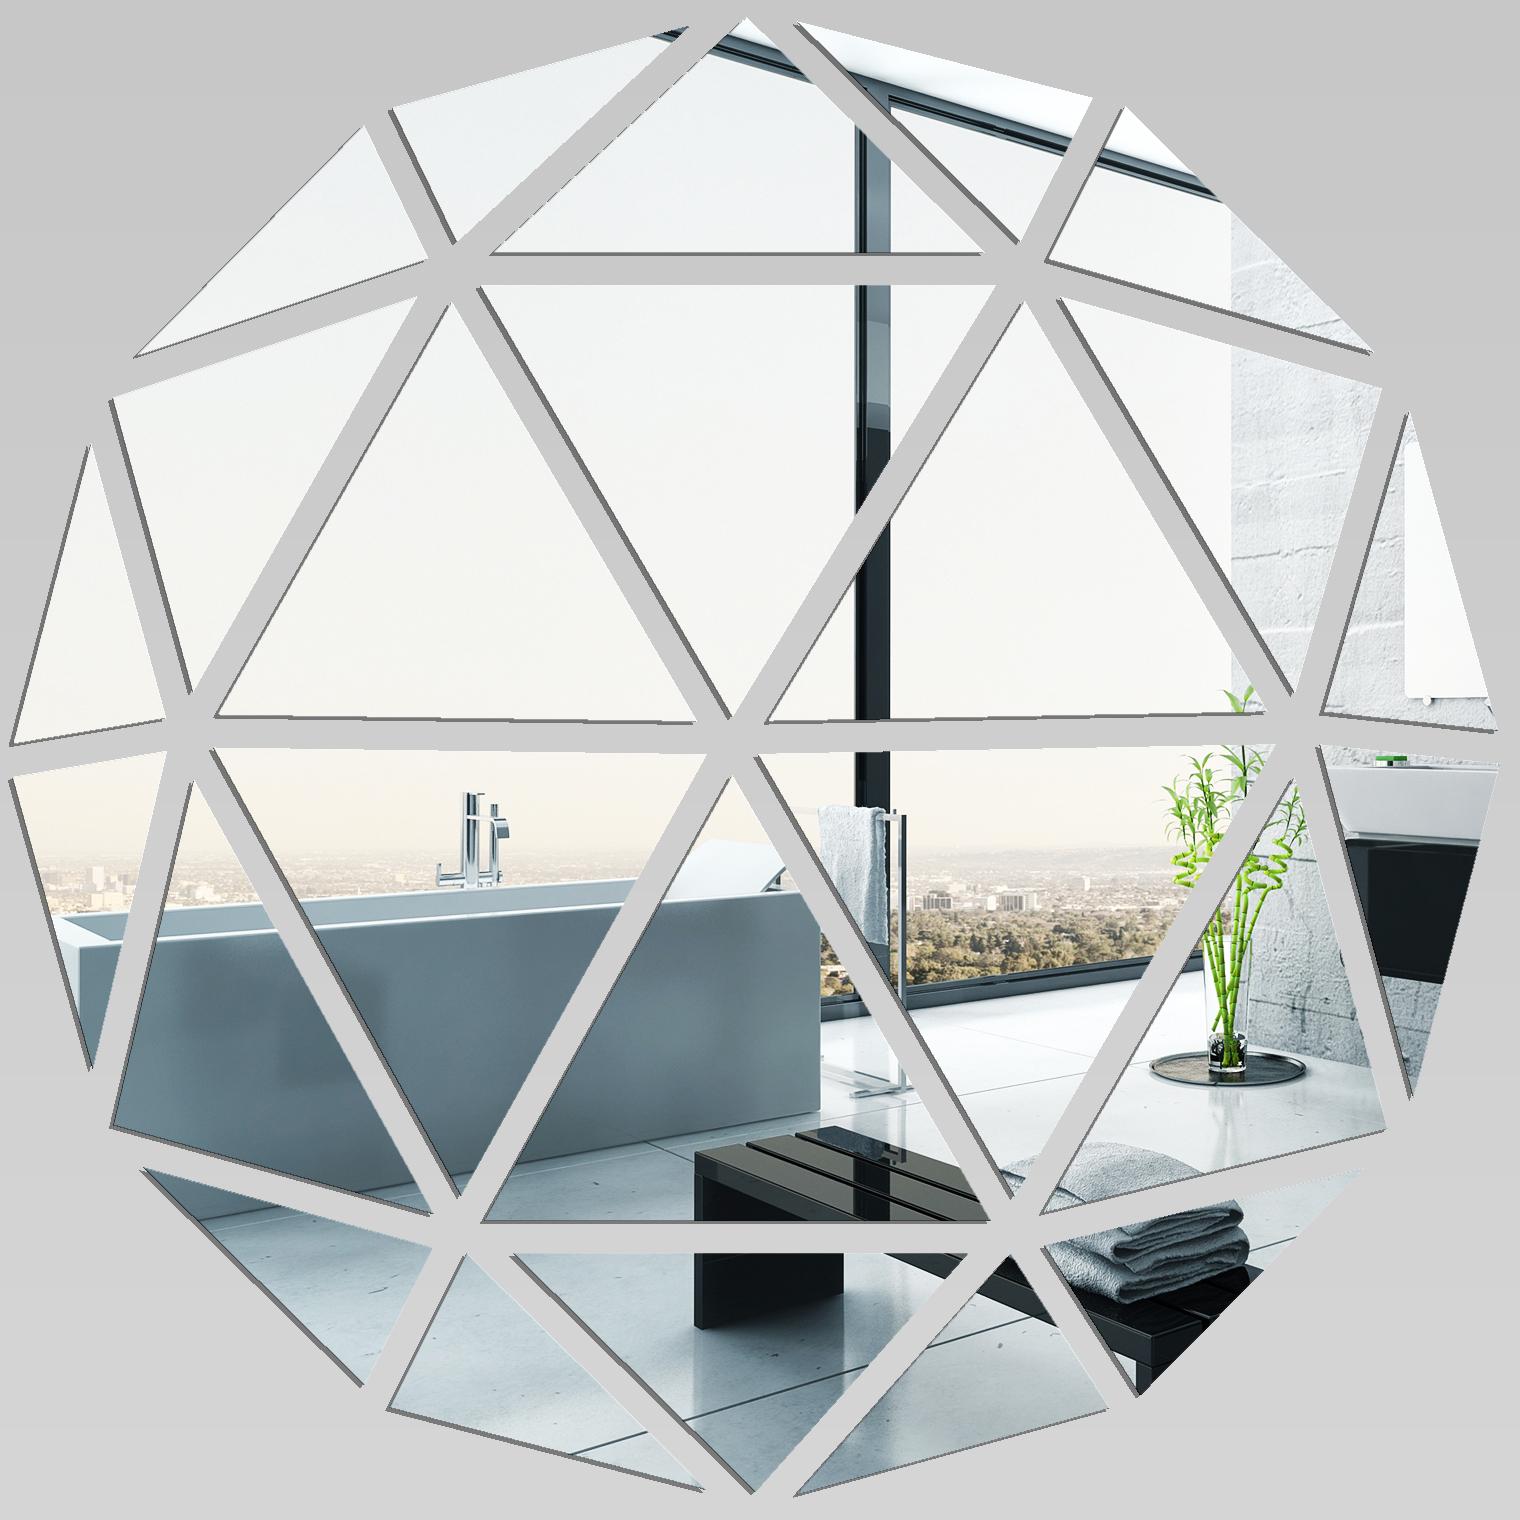 Miroir plexiglass acrylique mosa que en triangles pas cher for Miroir acrylique